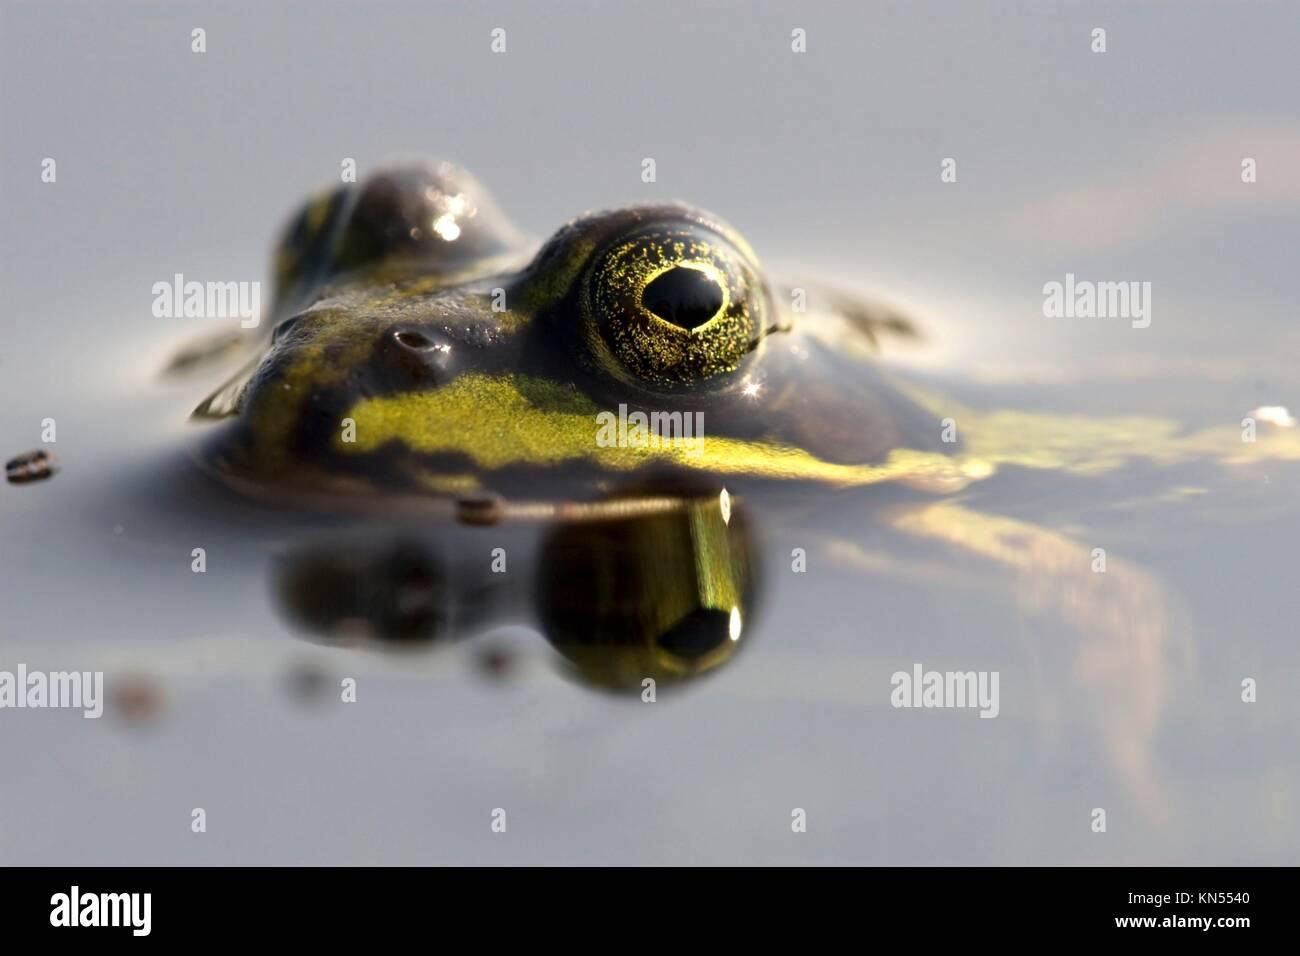 Rana esculenta synklepton, frog, green frog, fen, marsh frog, water, animal, close-up, portrait, Netherlands, heath,. - Stock Image